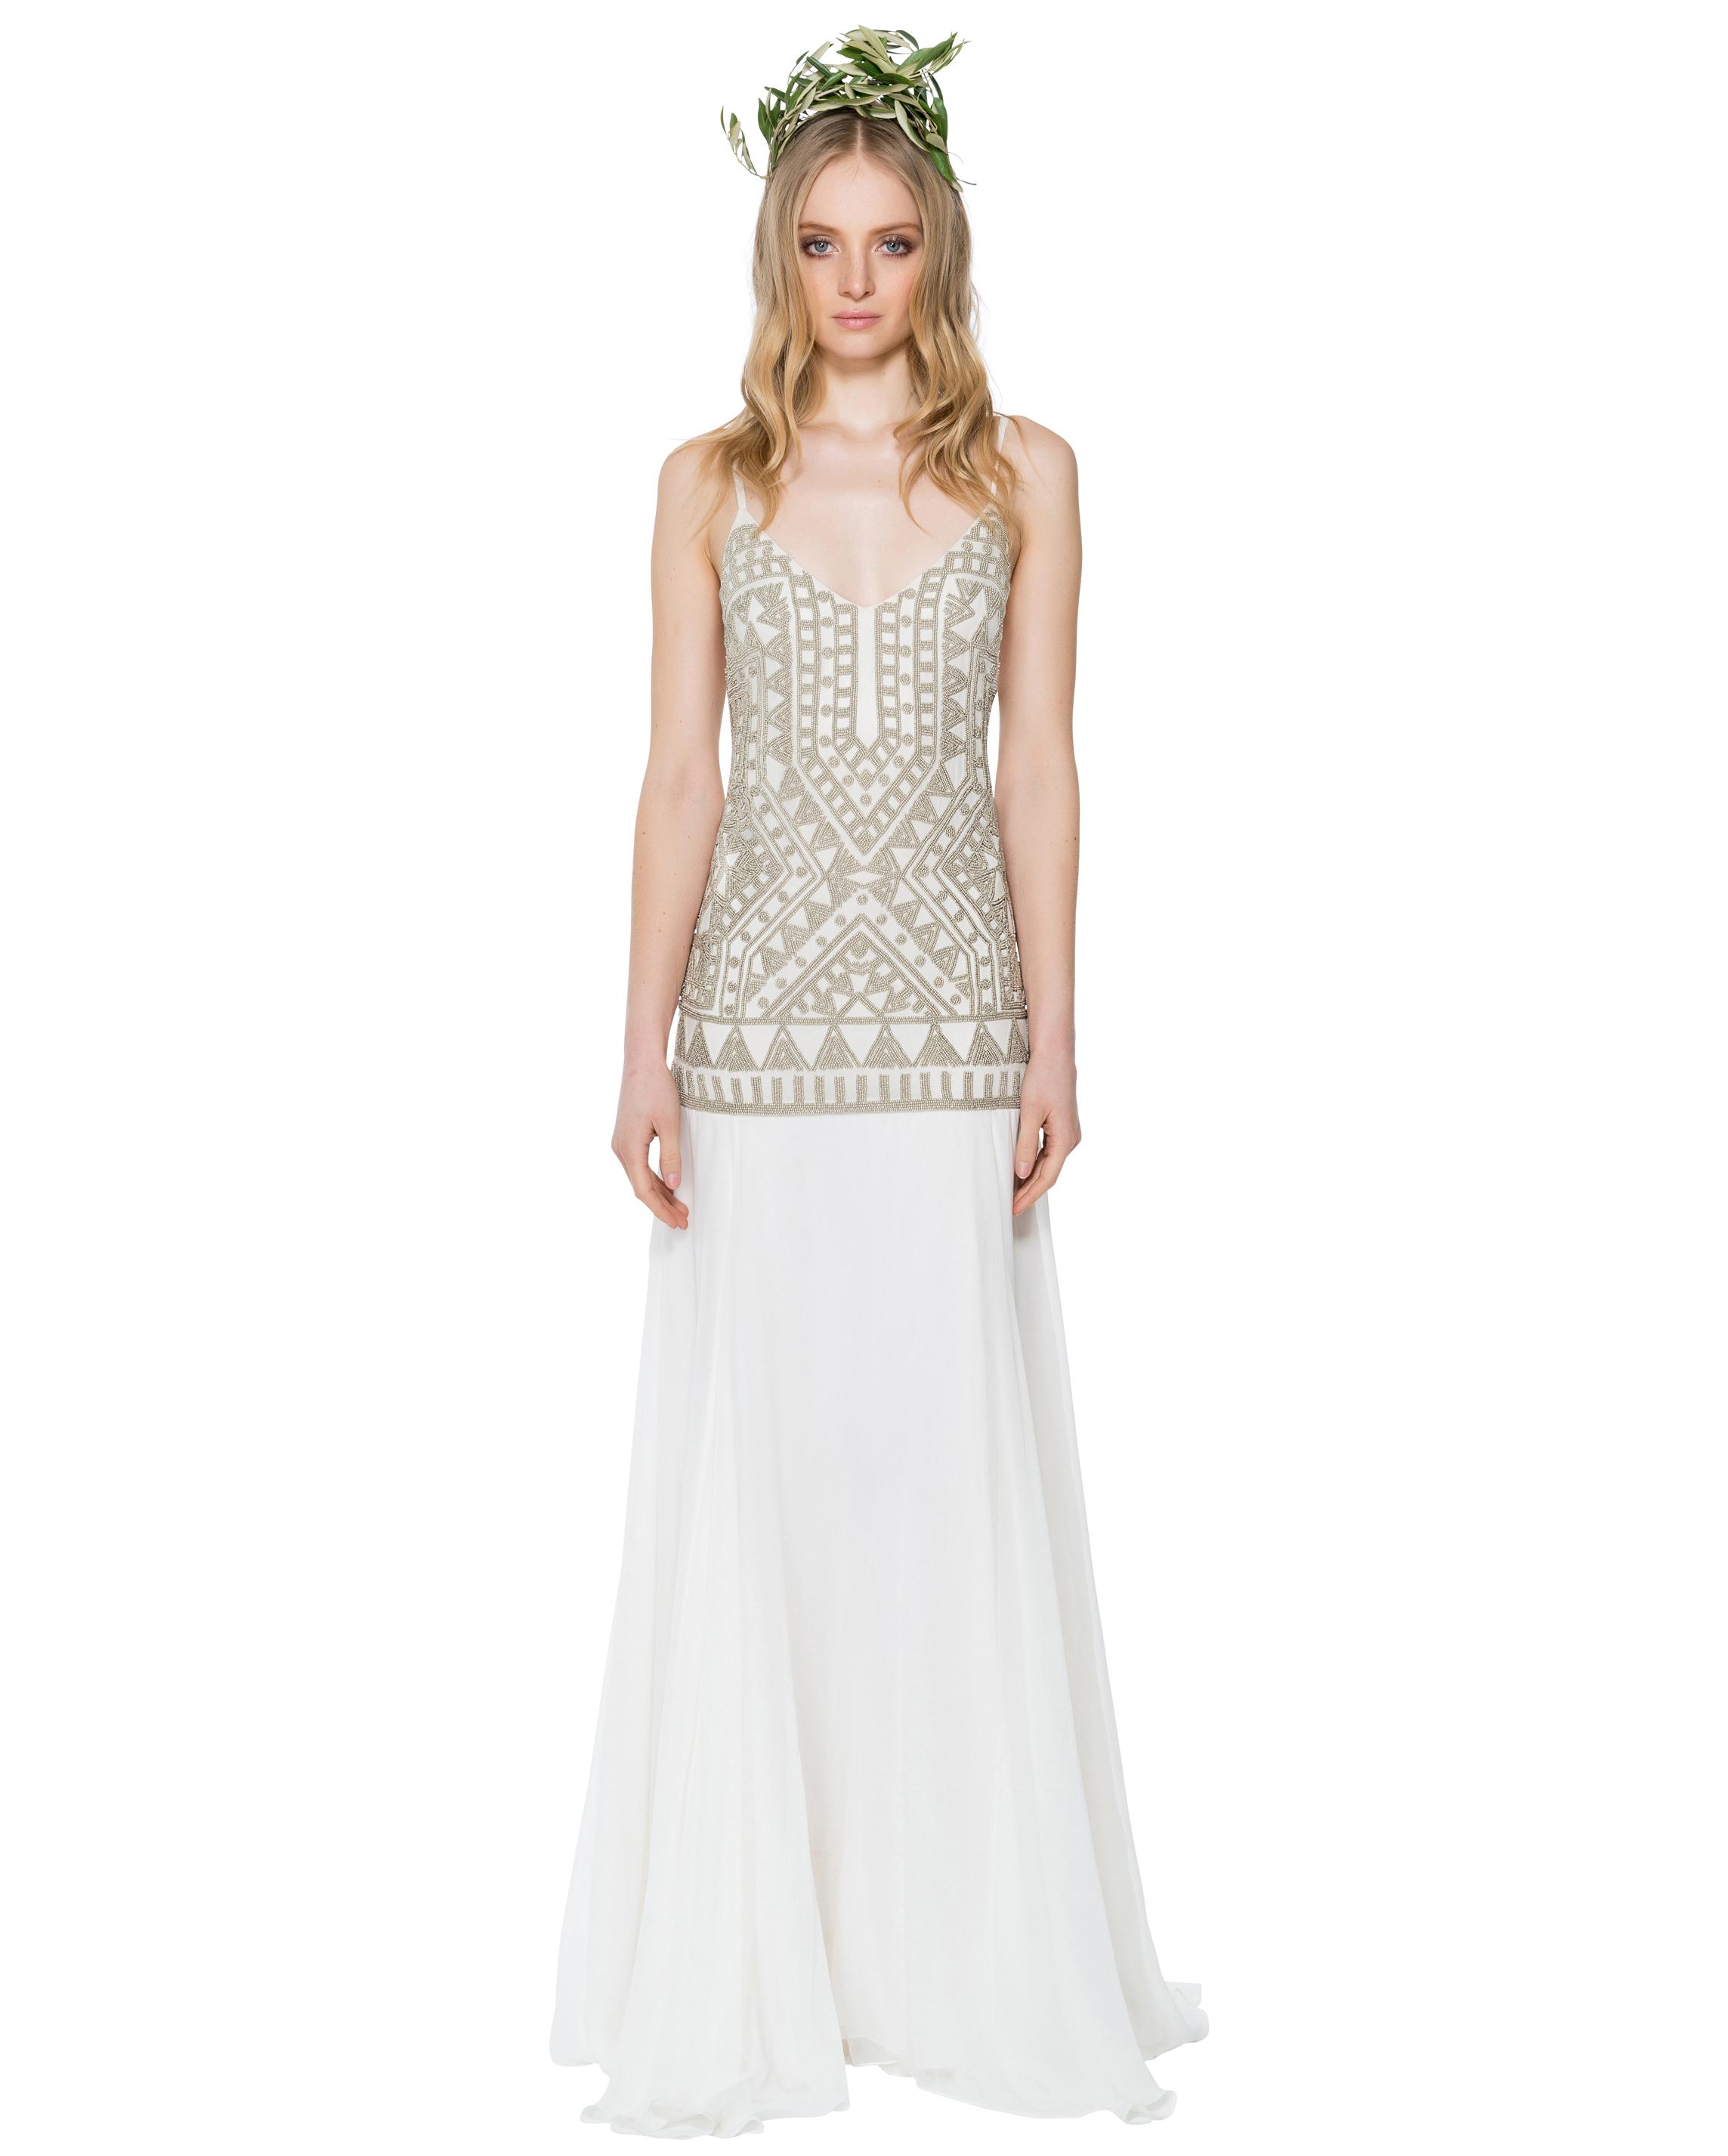 50-states-wedding-dresses-new-mexico-mara-hoffman-0615.jpg